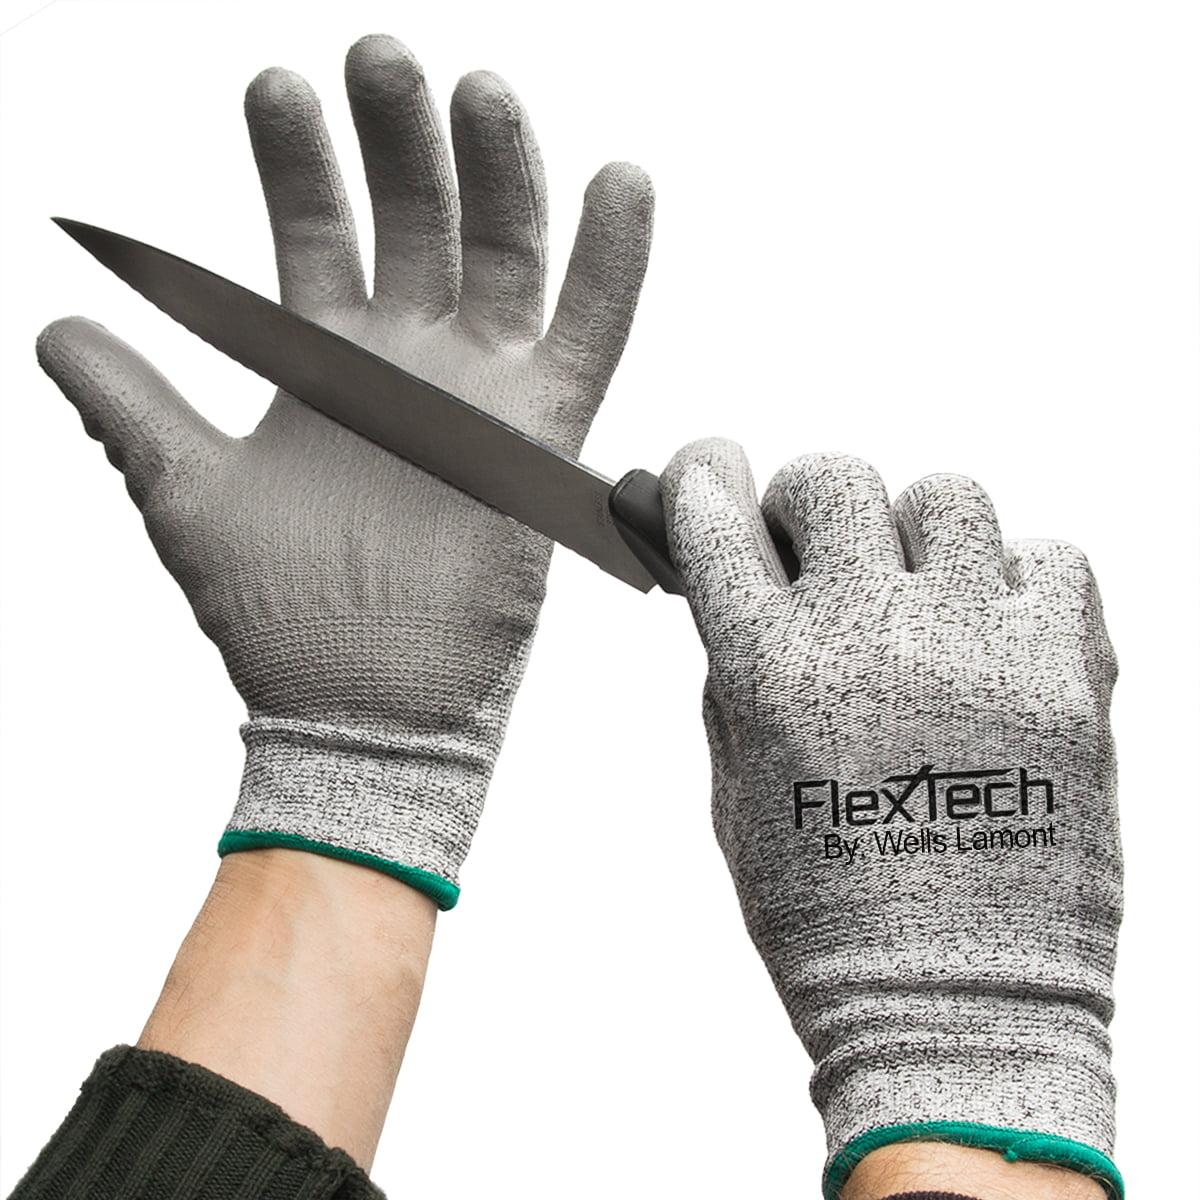 3 Pairs Of Wells Lamont Flextech Cut Resistant Gloves Work HDPE High Performance